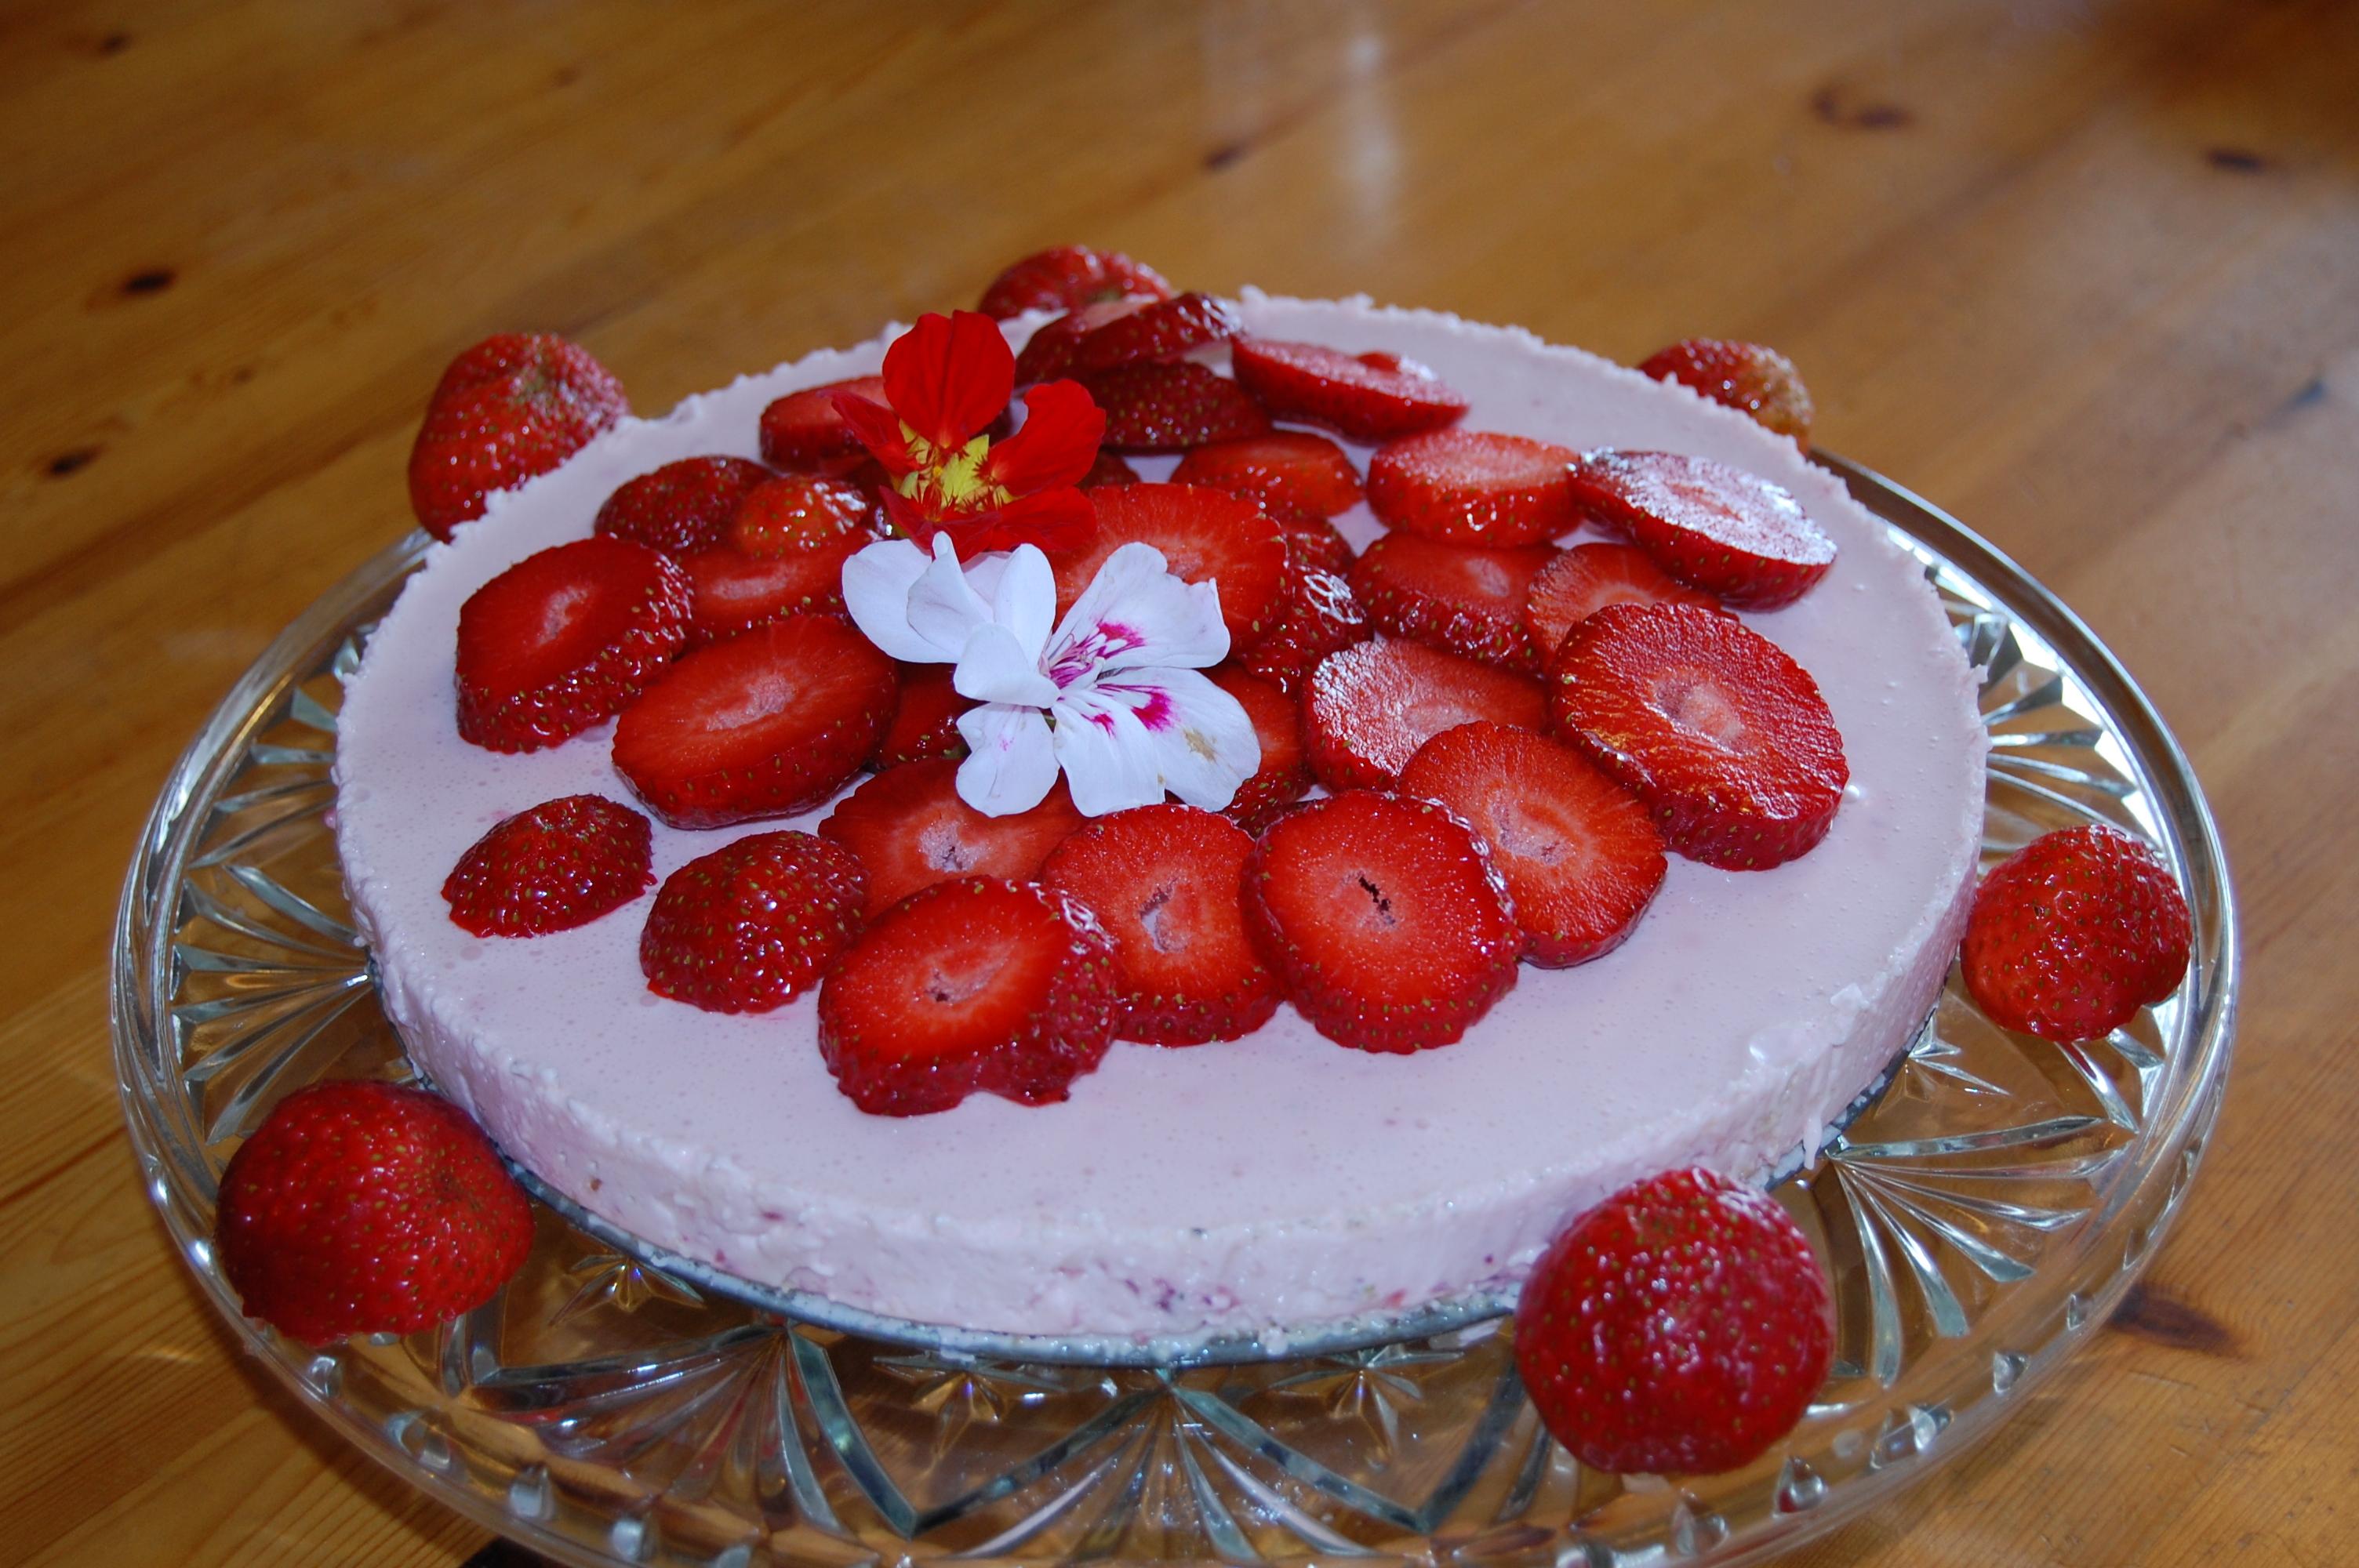 Somrig pannacottapaj med jordgubbar